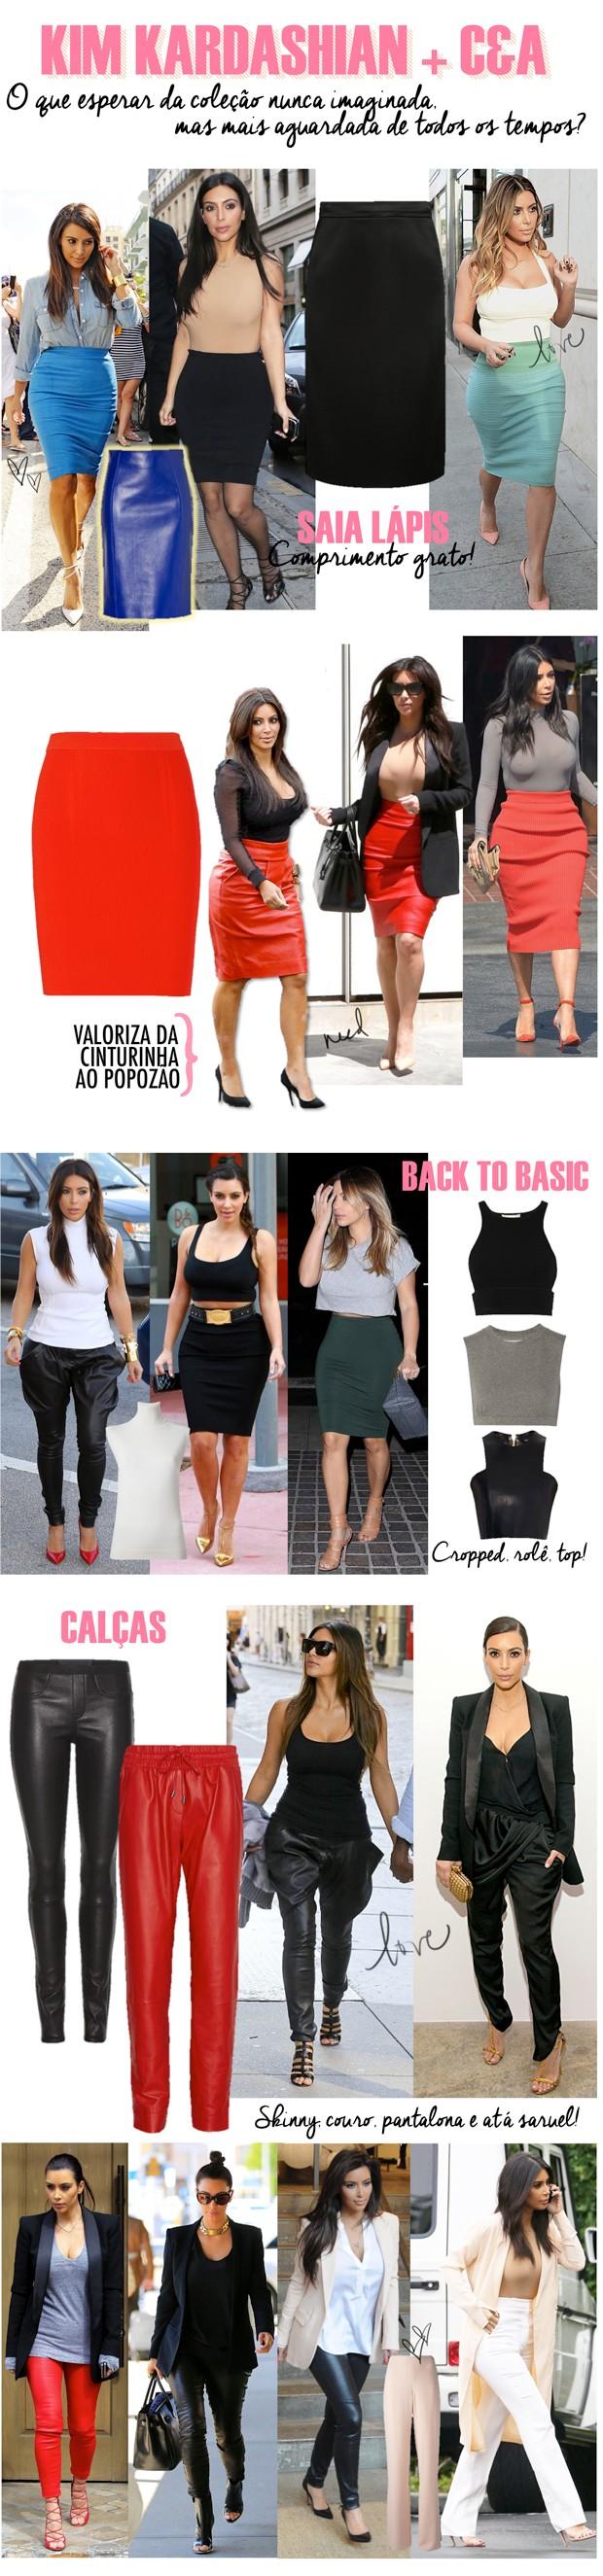 kim-kardashian-cea-1